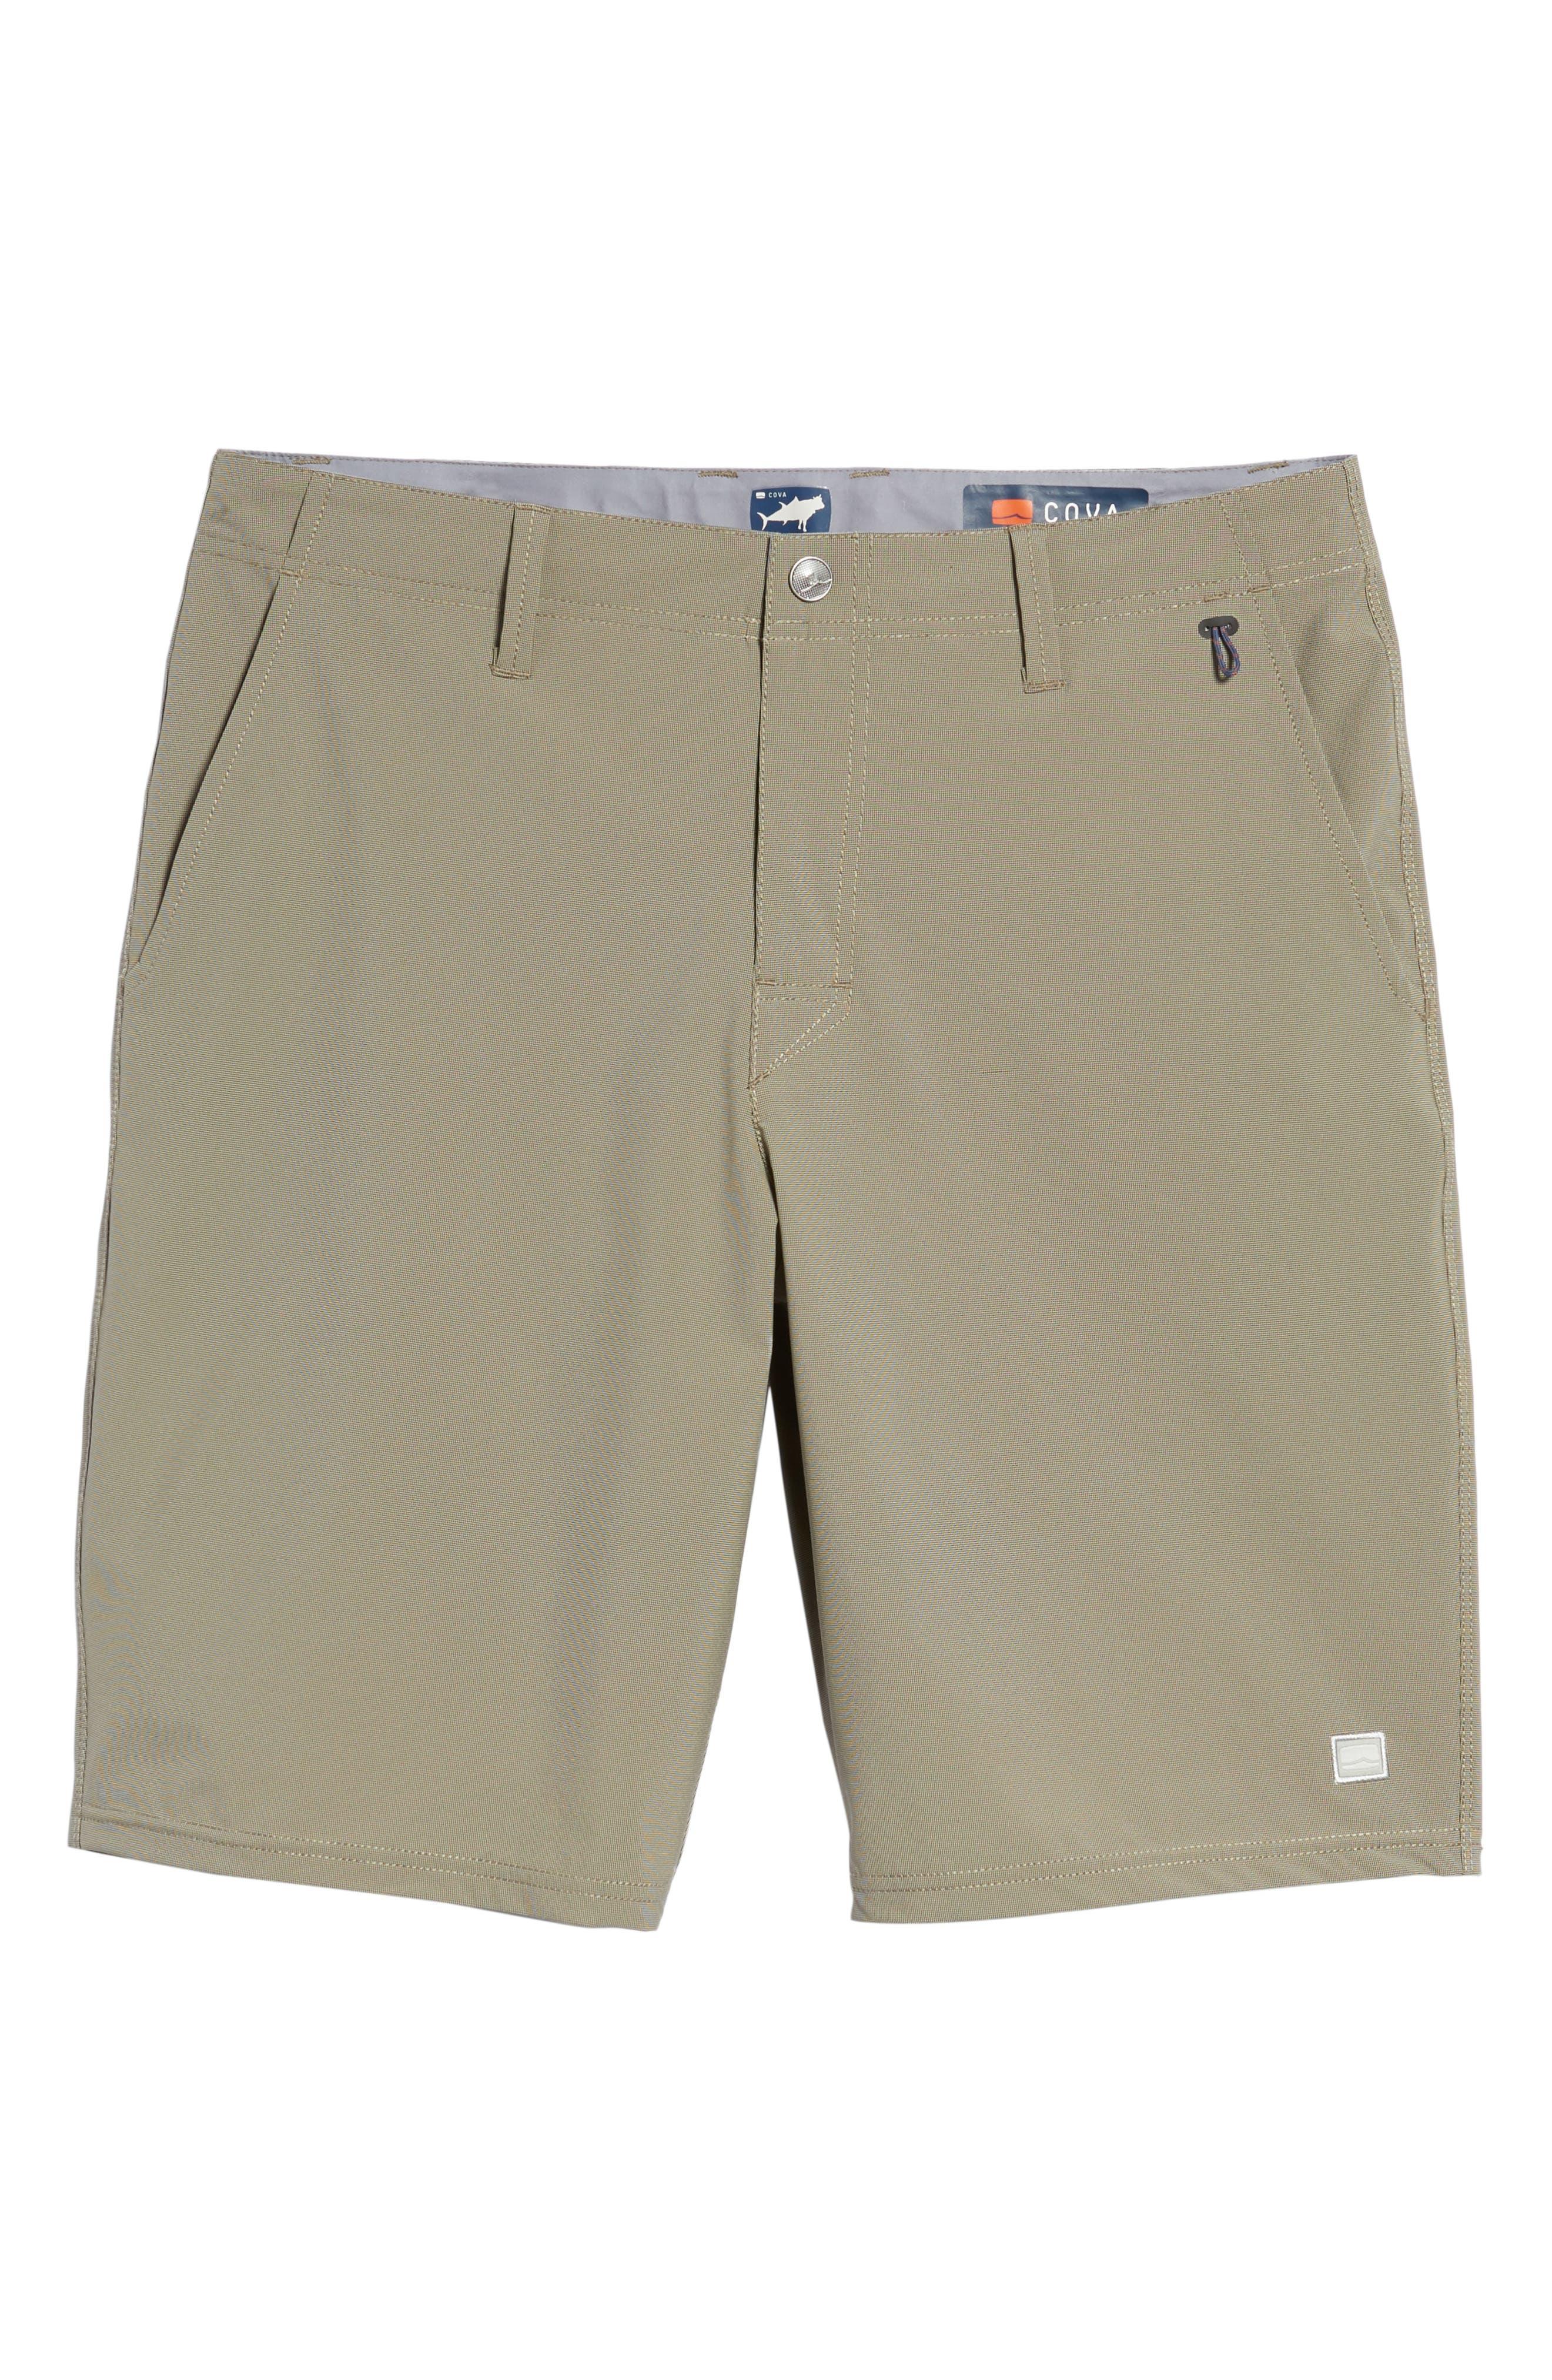 Seaside Hybrid Shorts,                             Alternate thumbnail 6, color,                             ESPRESSO